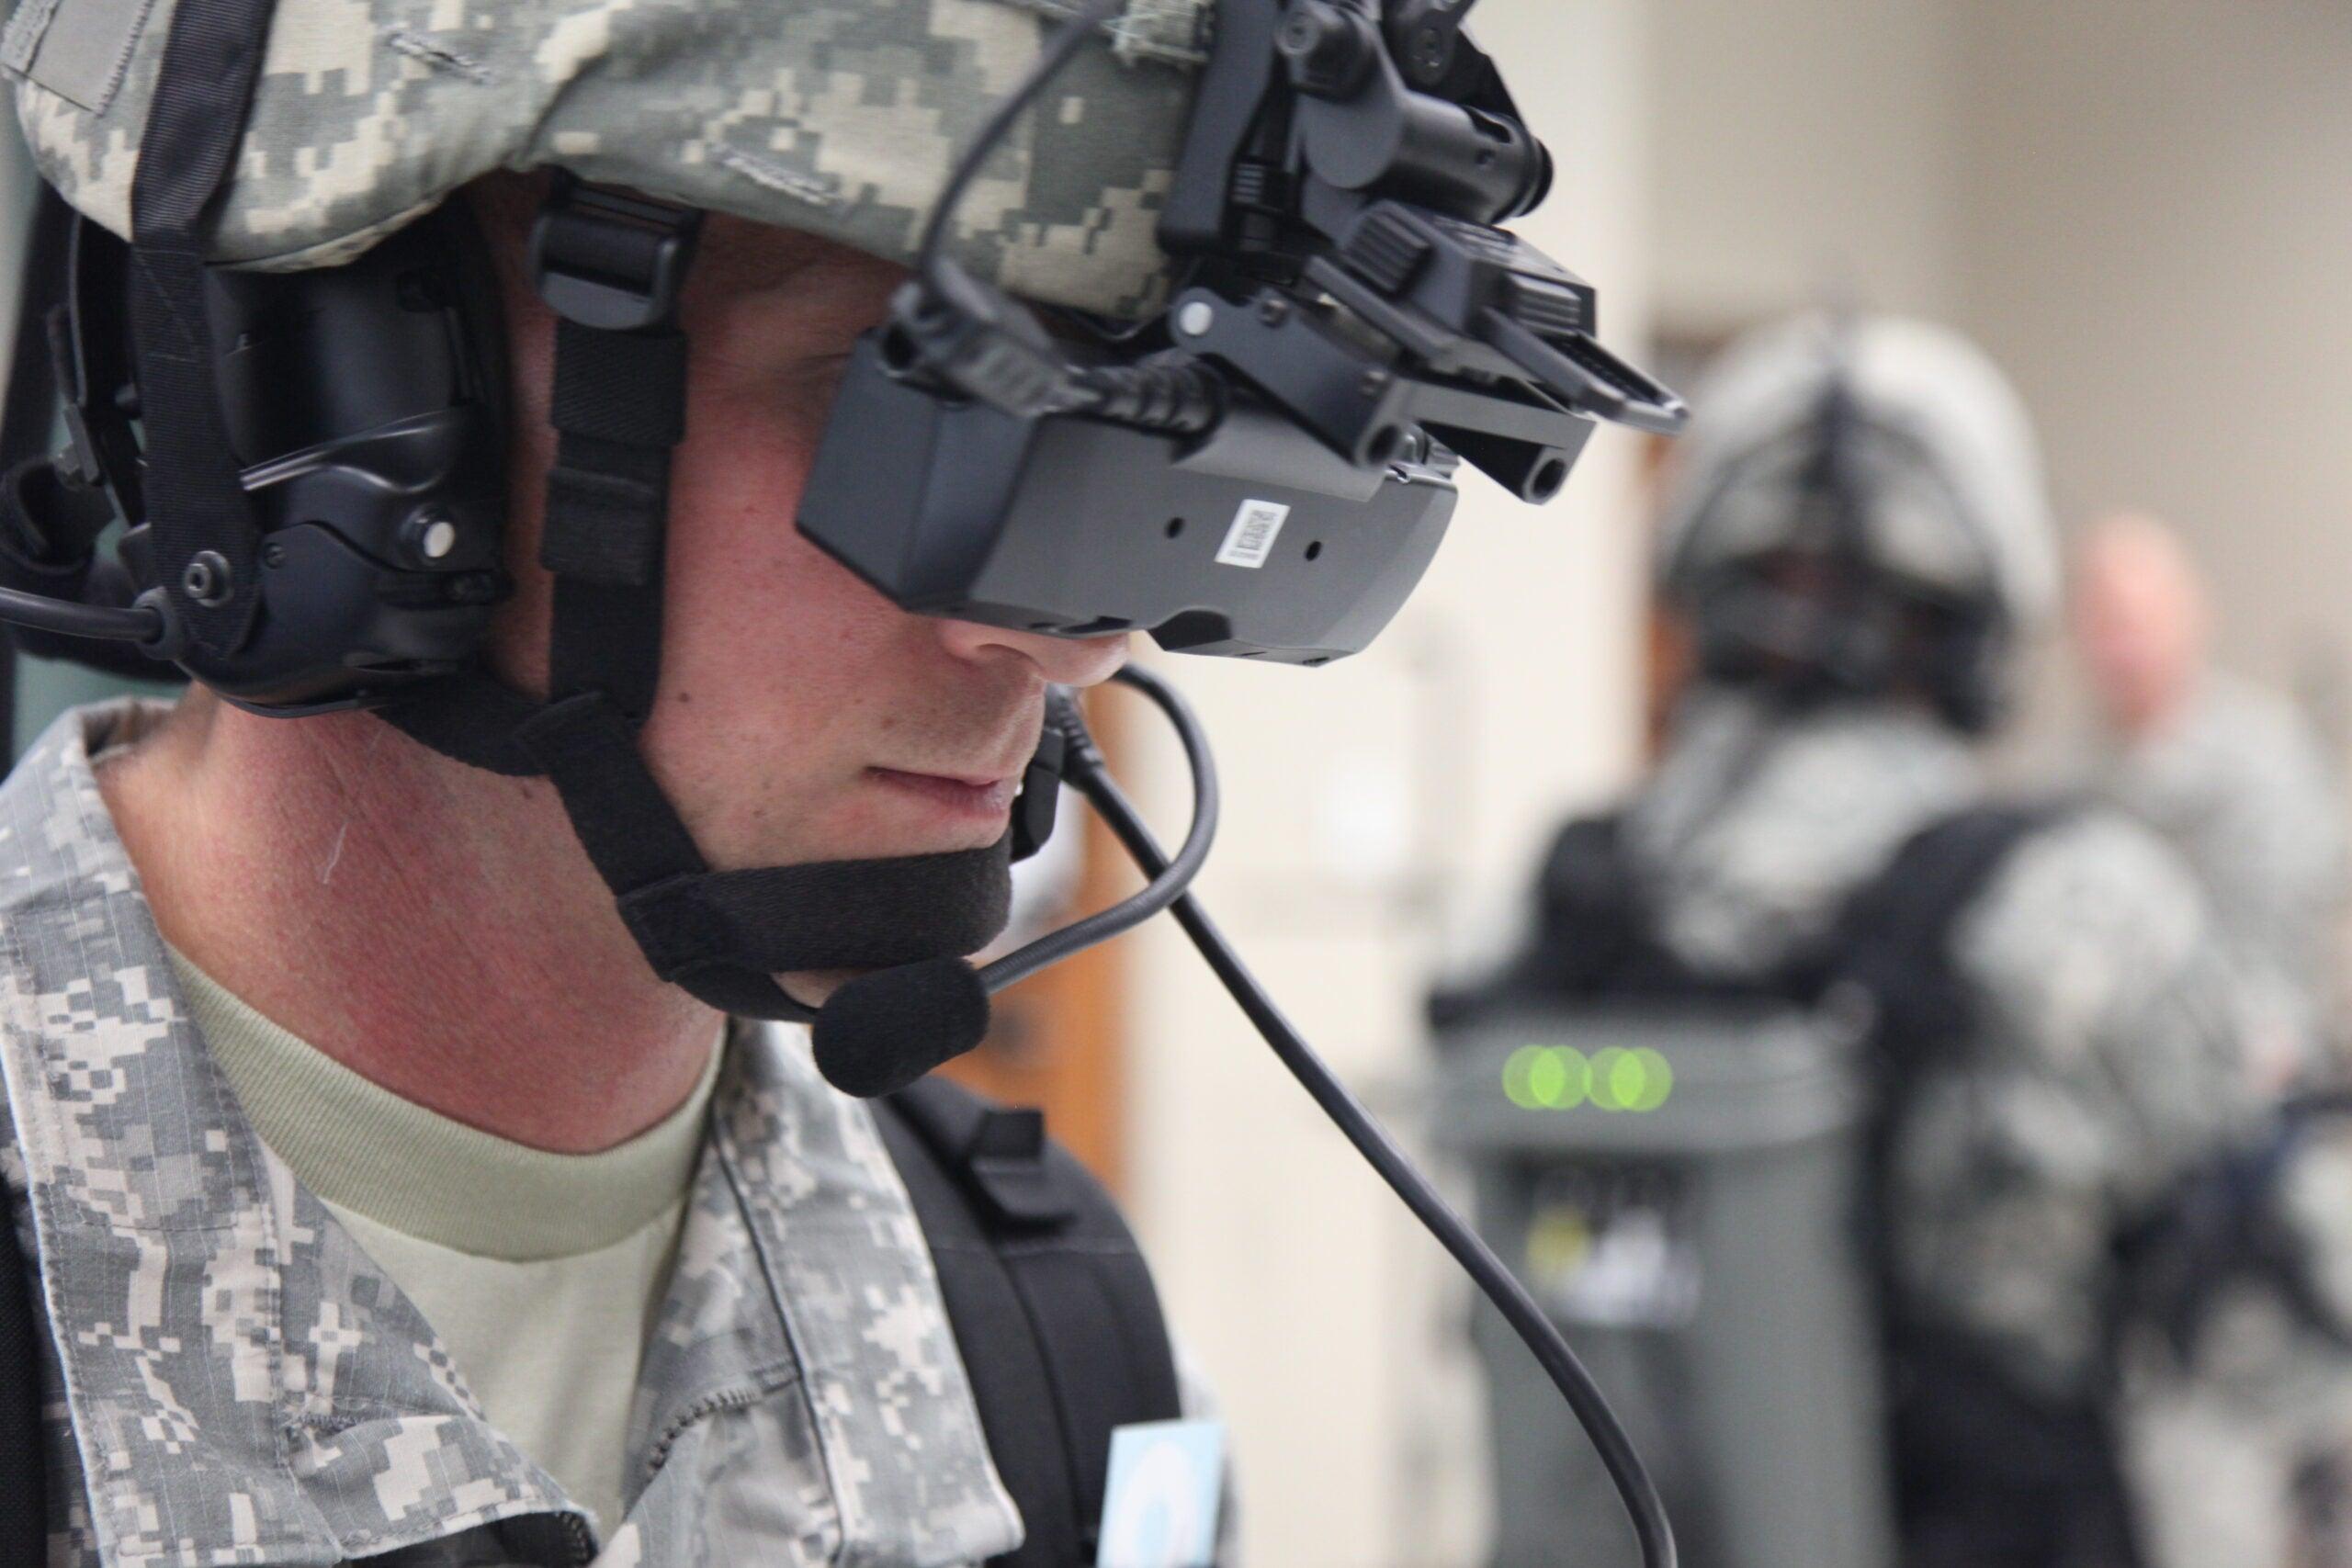 How virtual reality can make an impact on treating PTSD